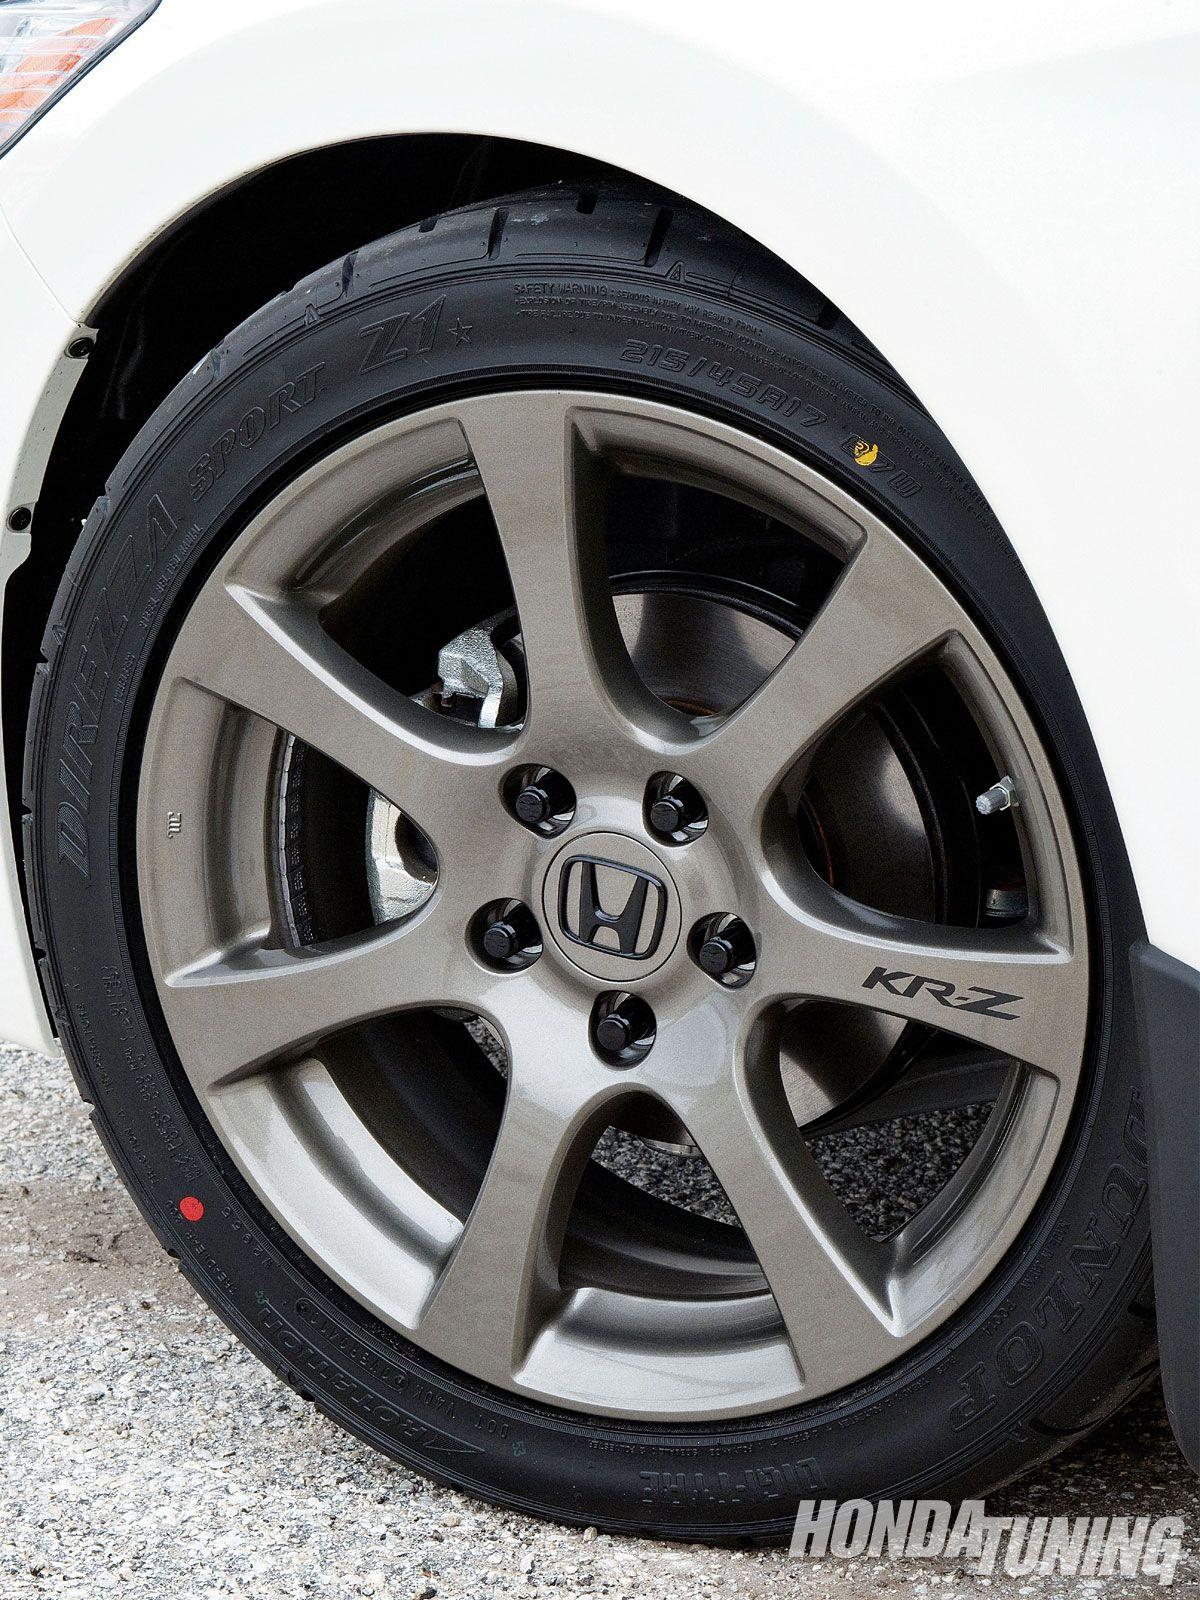 htup_1104_07_o+2010_honda_crz+hfp_wheels